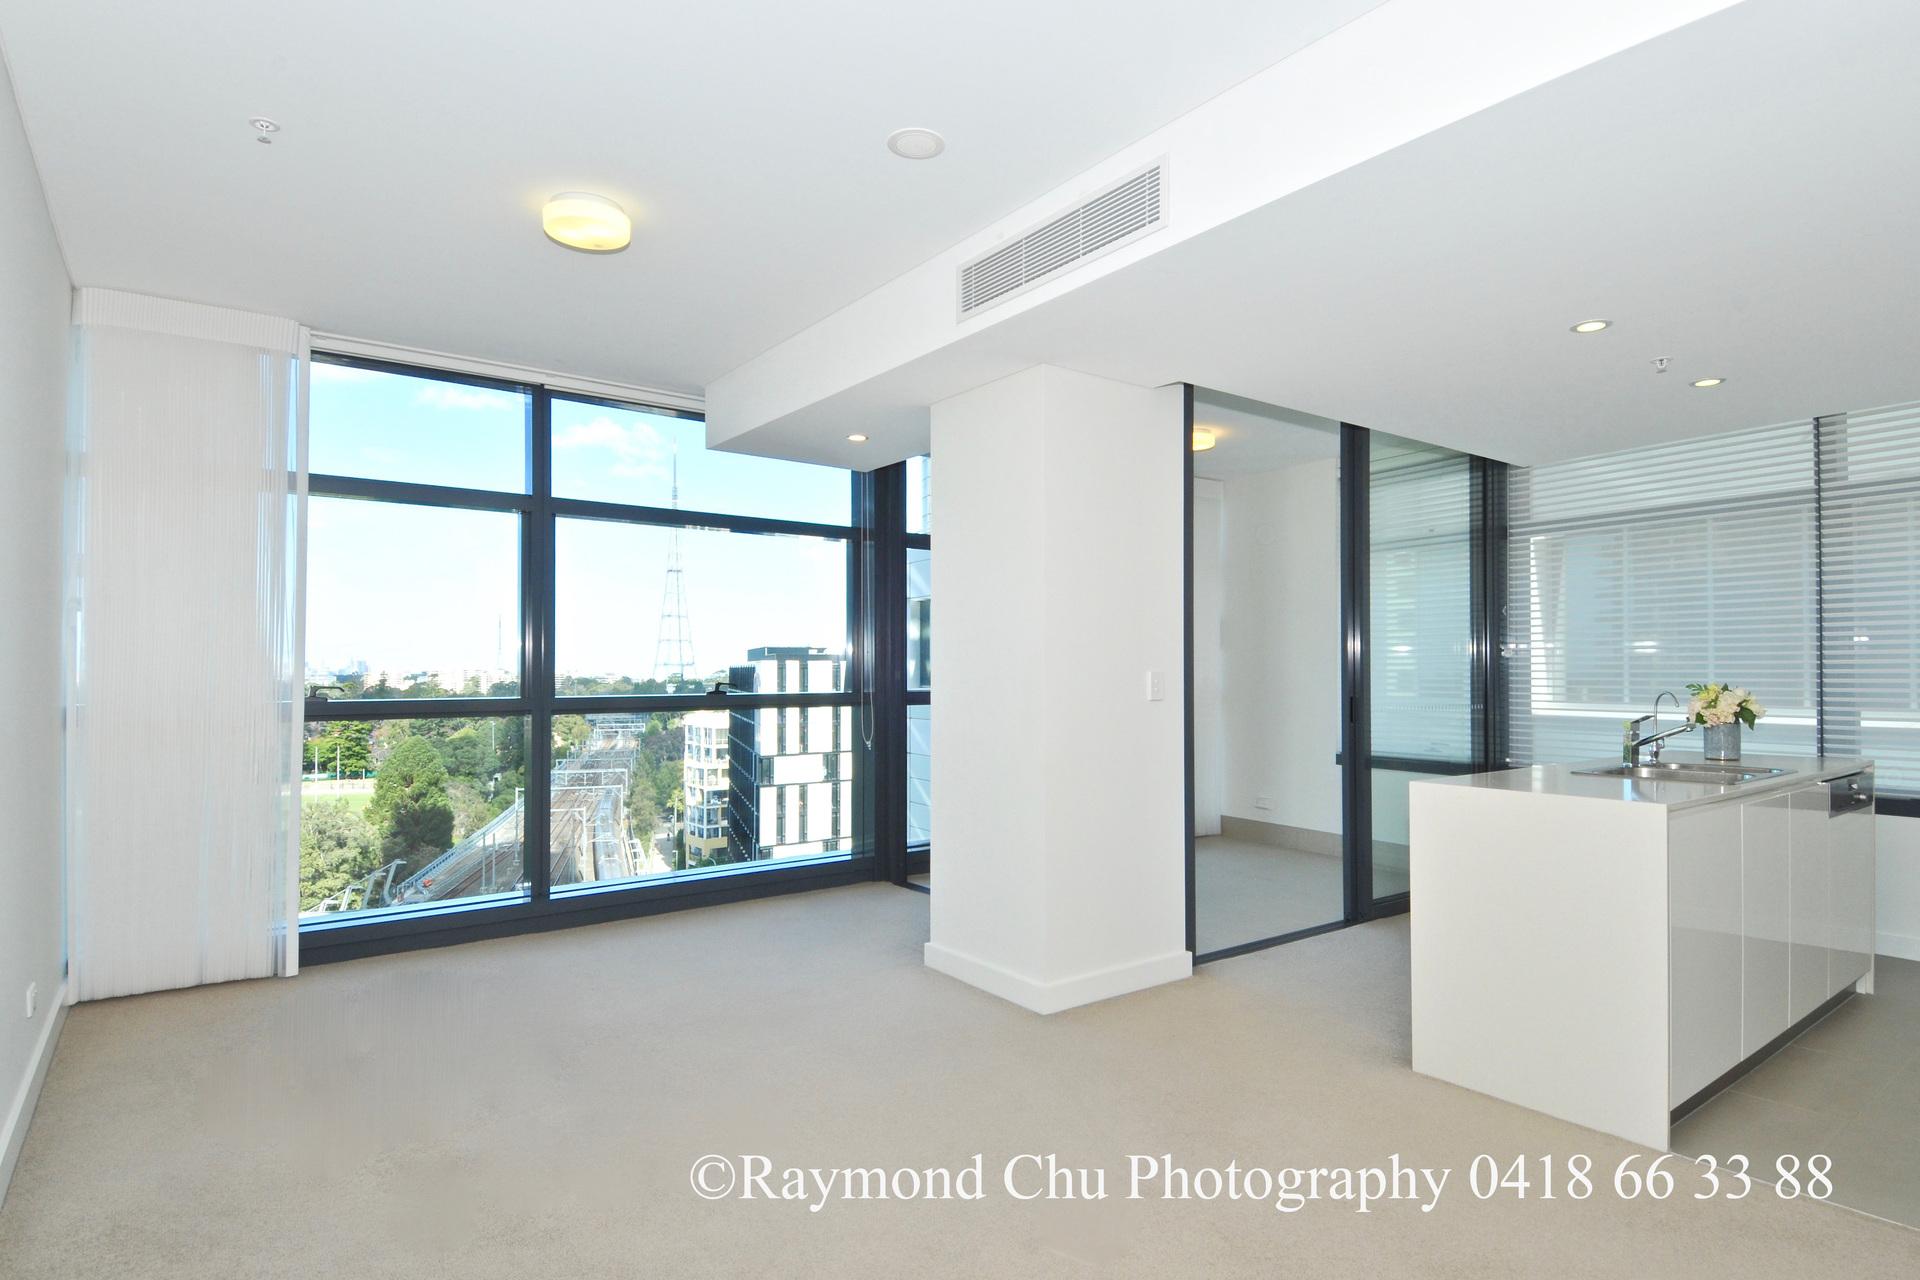 Unit 1009/438 Victoria Avenue,  Chatswood